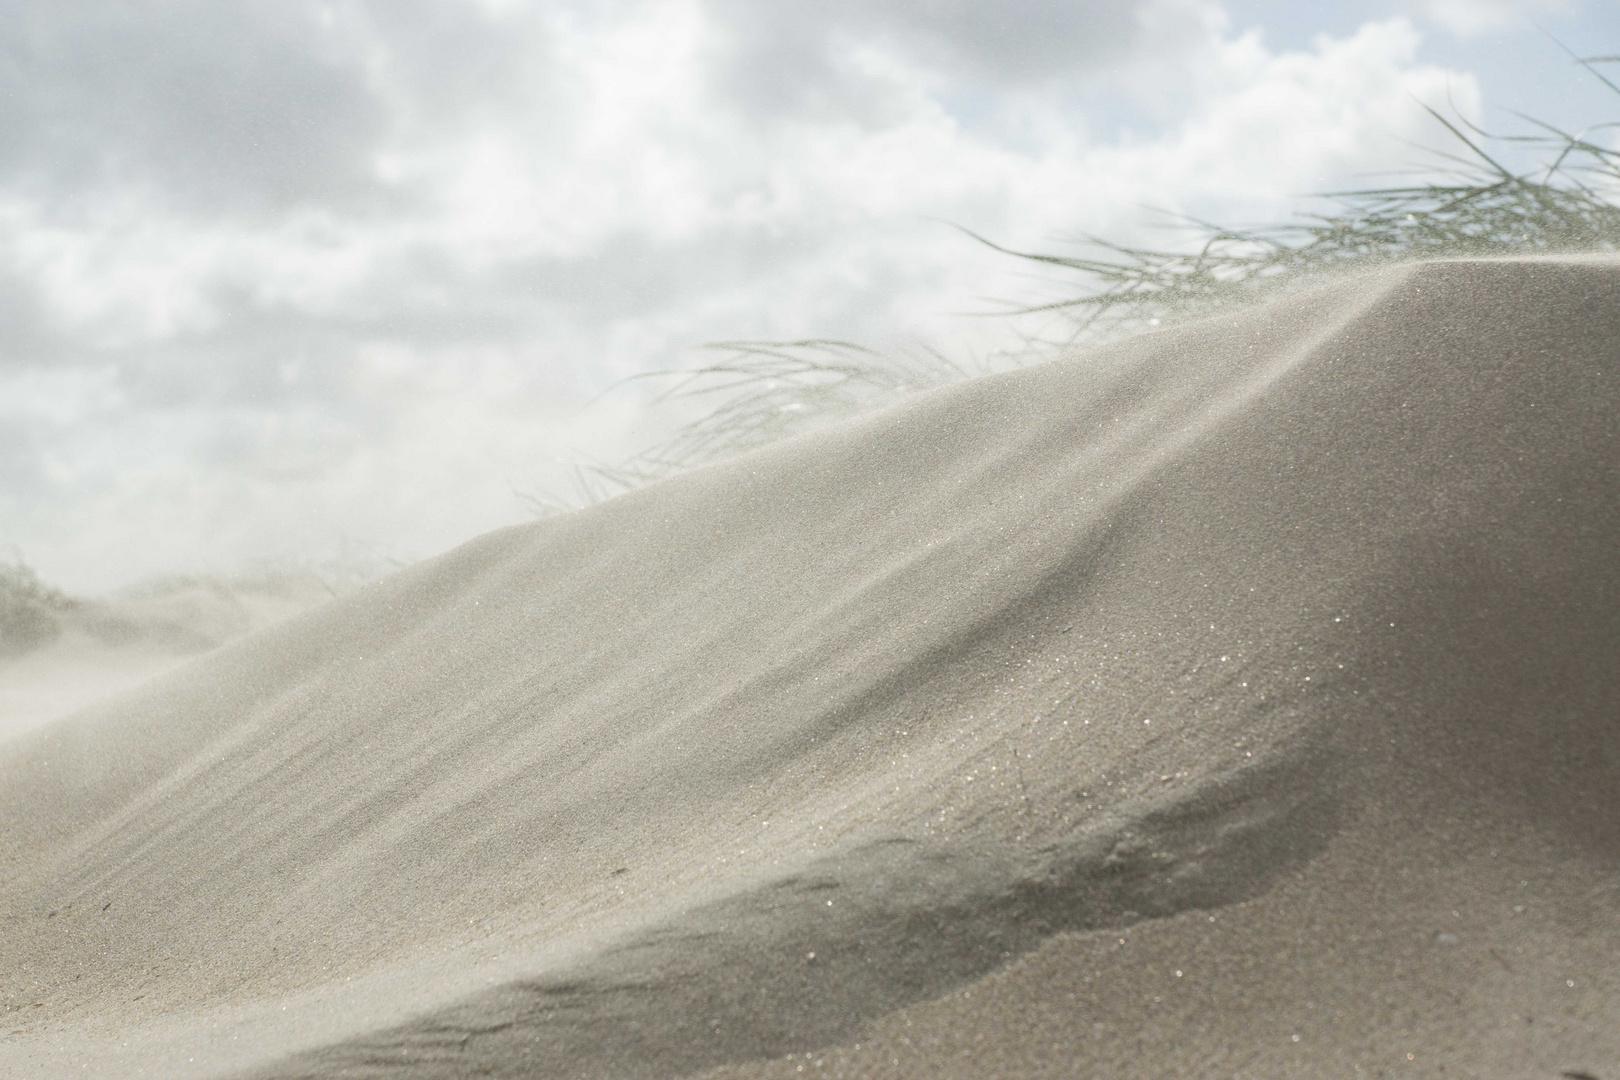 Dänemark 2015, Insel Rømø. Den Sand hat man nachher überall.